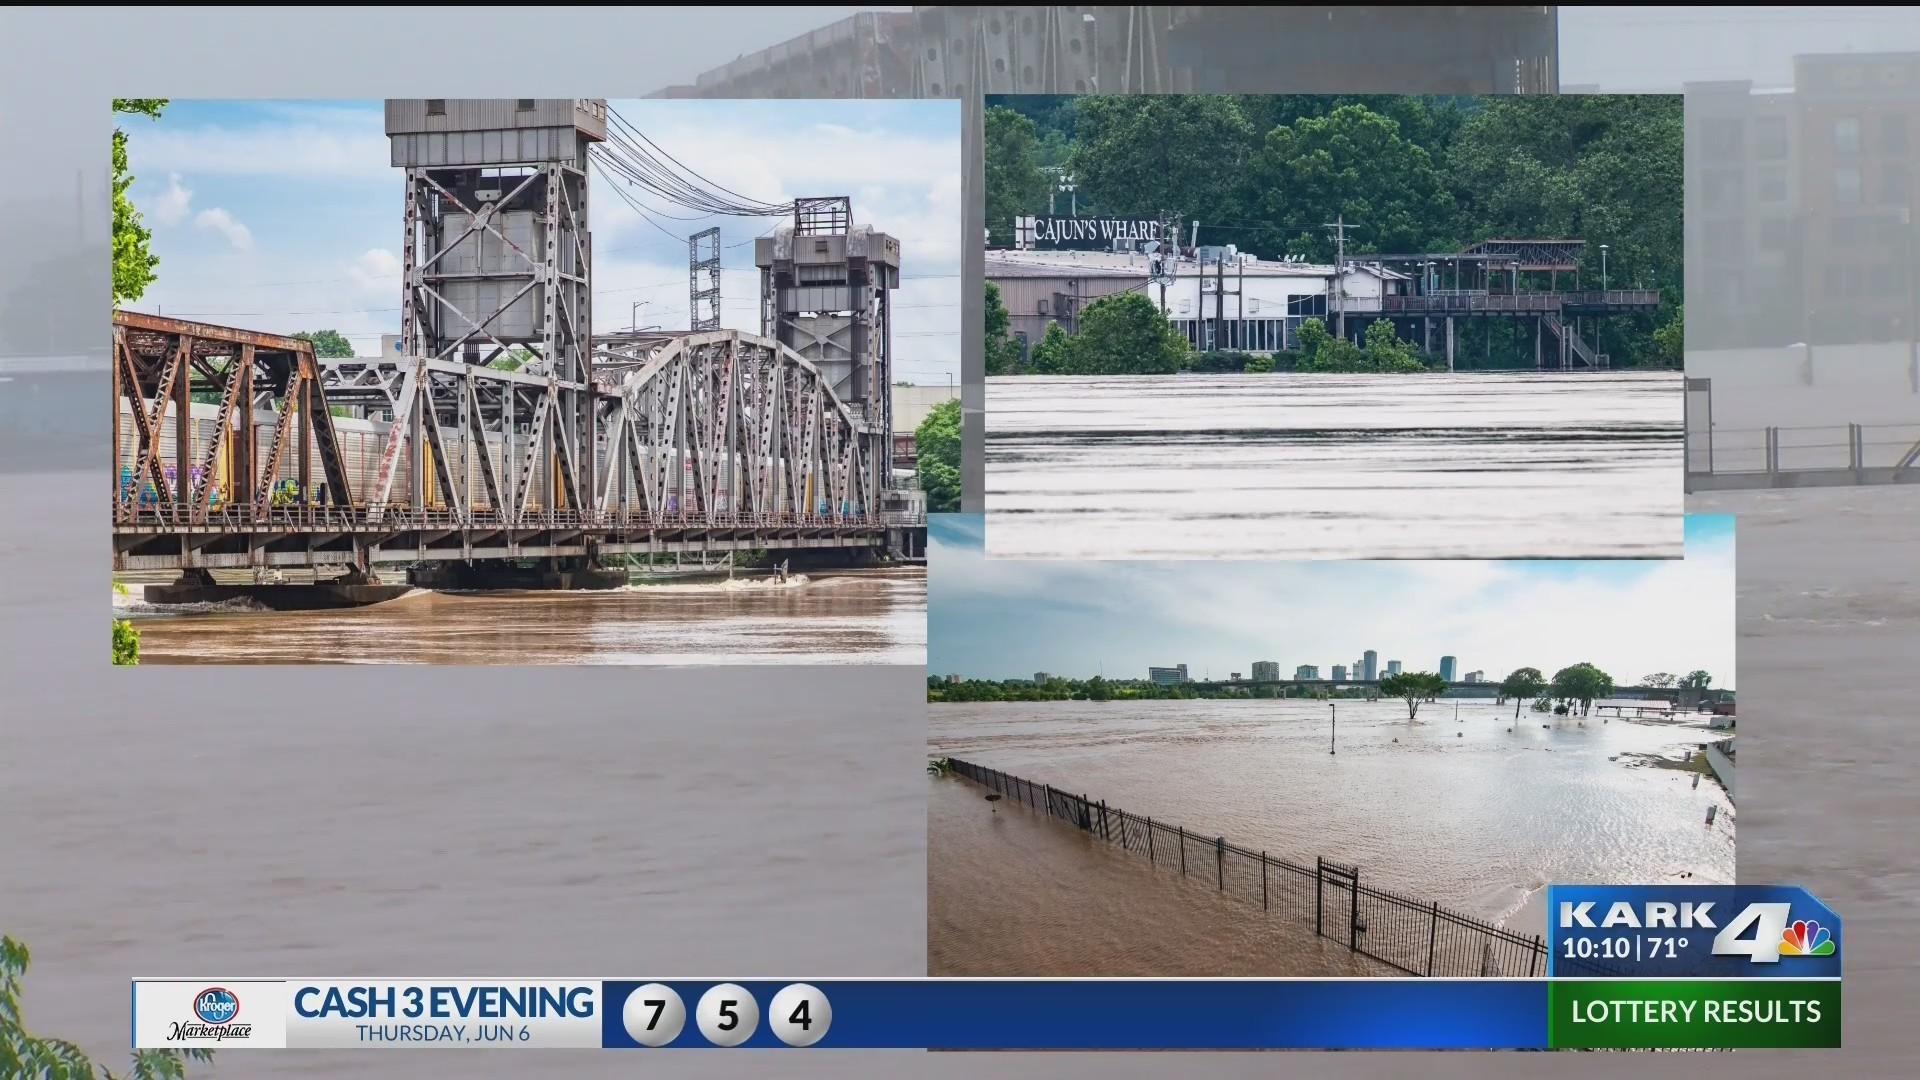 Historic river flooding through the eye of a lens